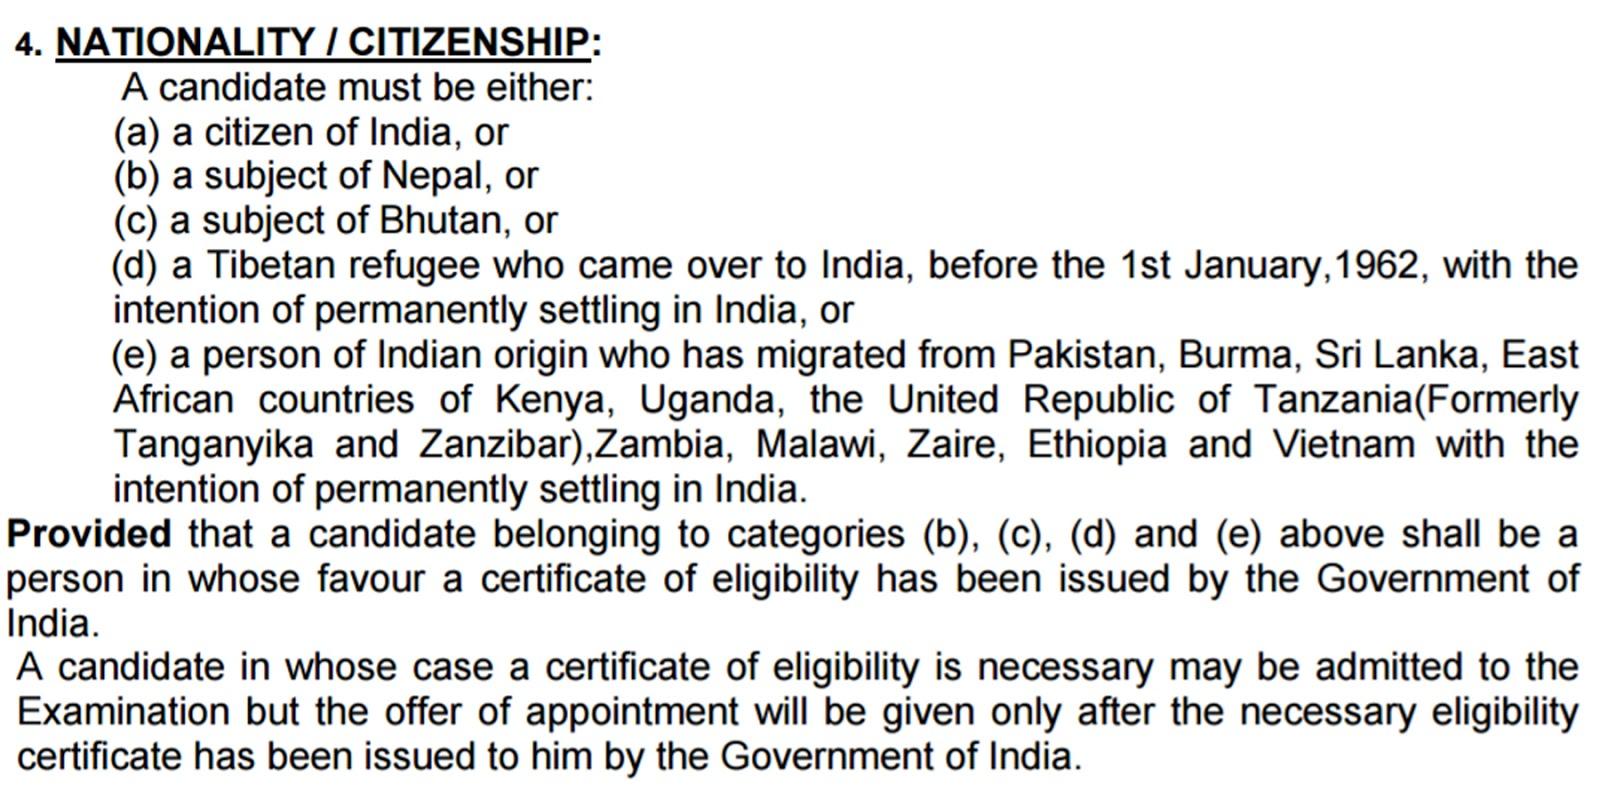 Nationality/ Citizenship